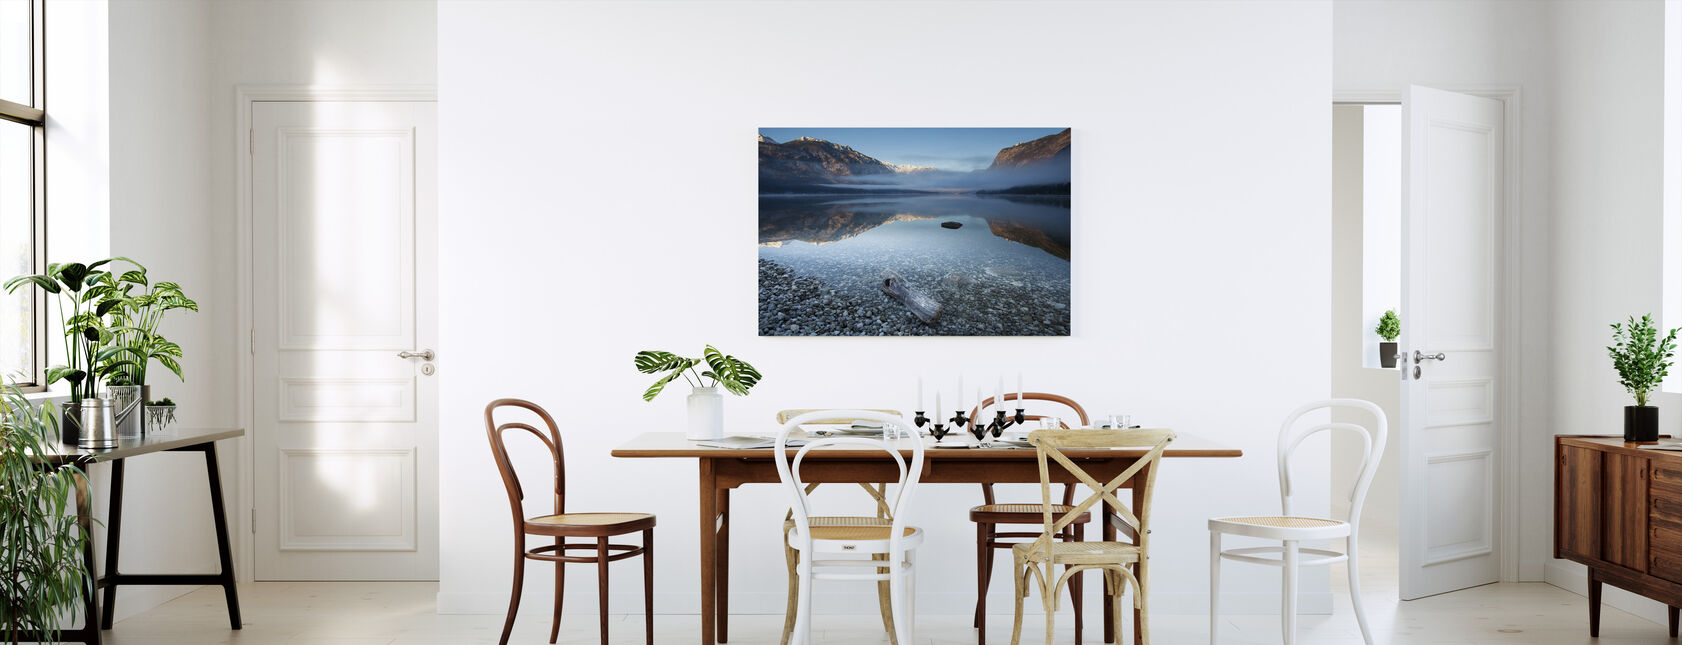 Bohinj's Tranquility - Canvas print - Kitchen